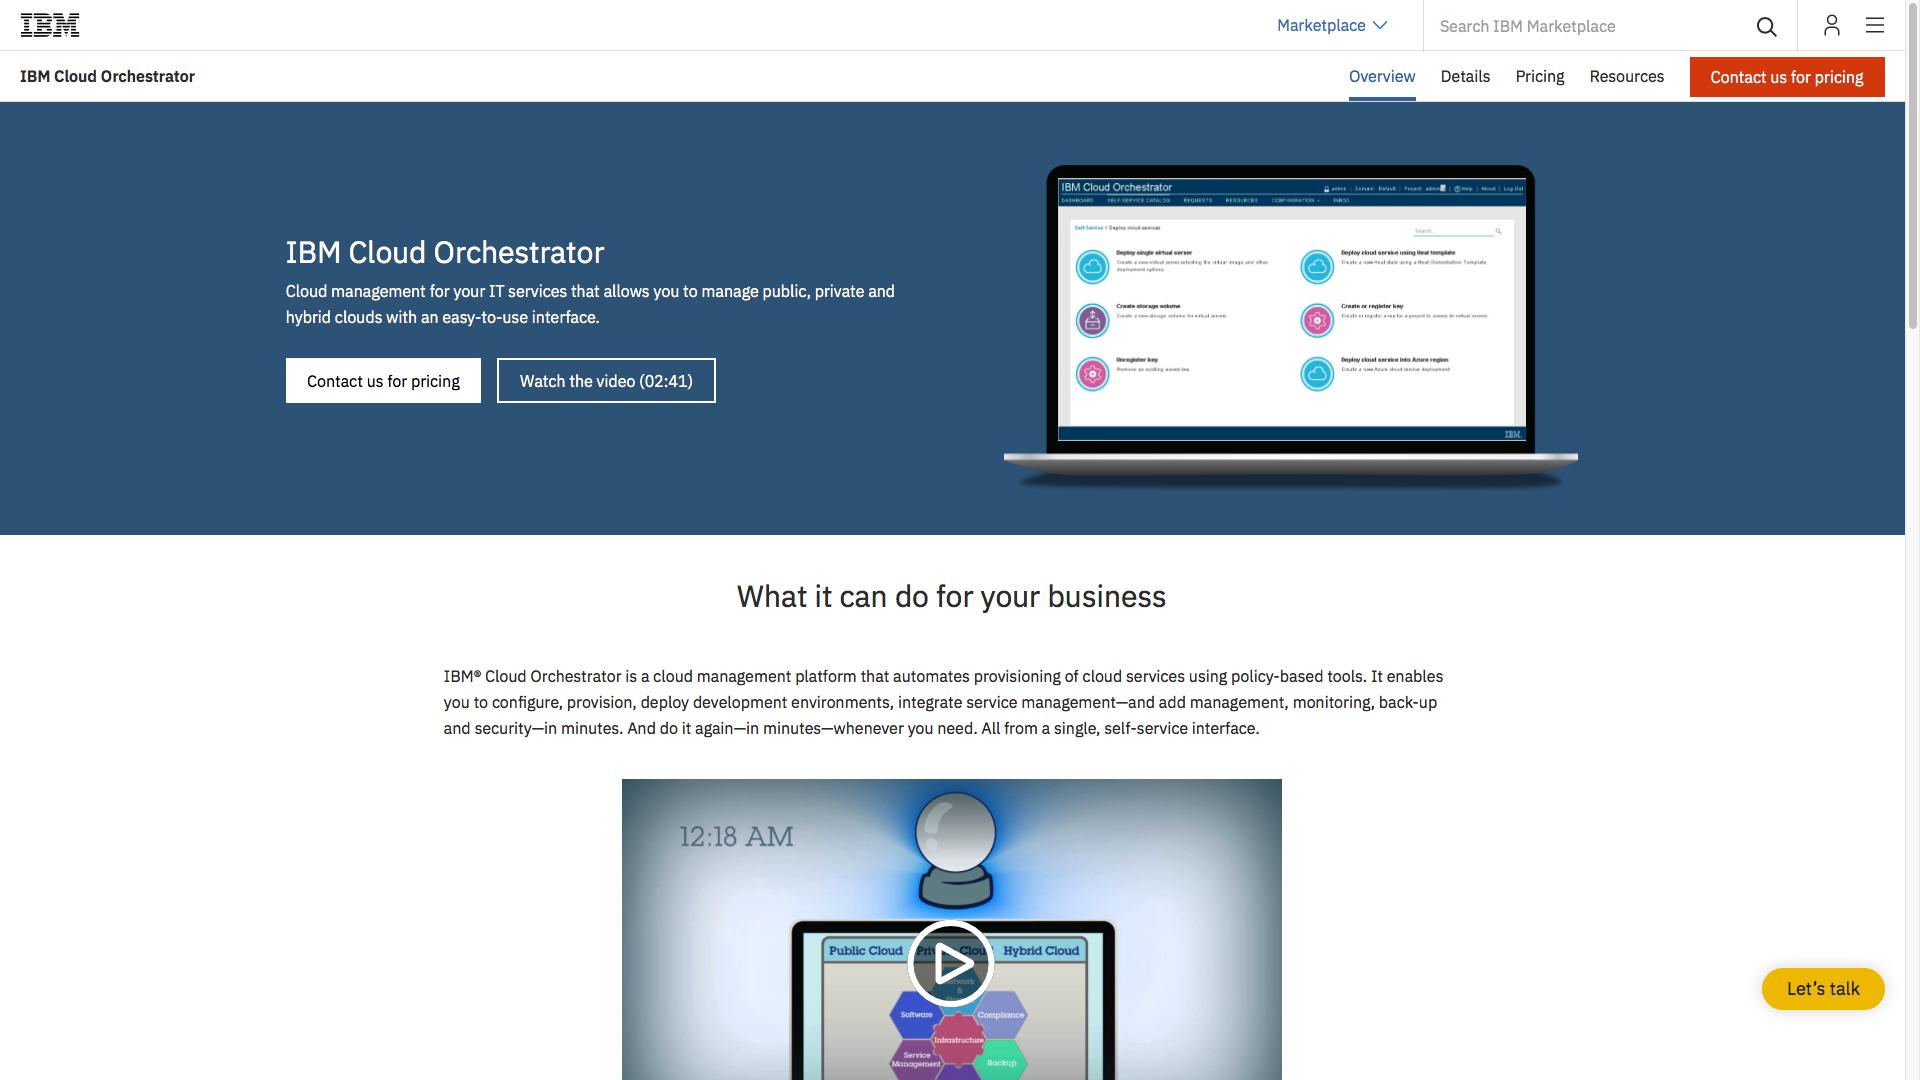 IBM Cloud Orchestrator